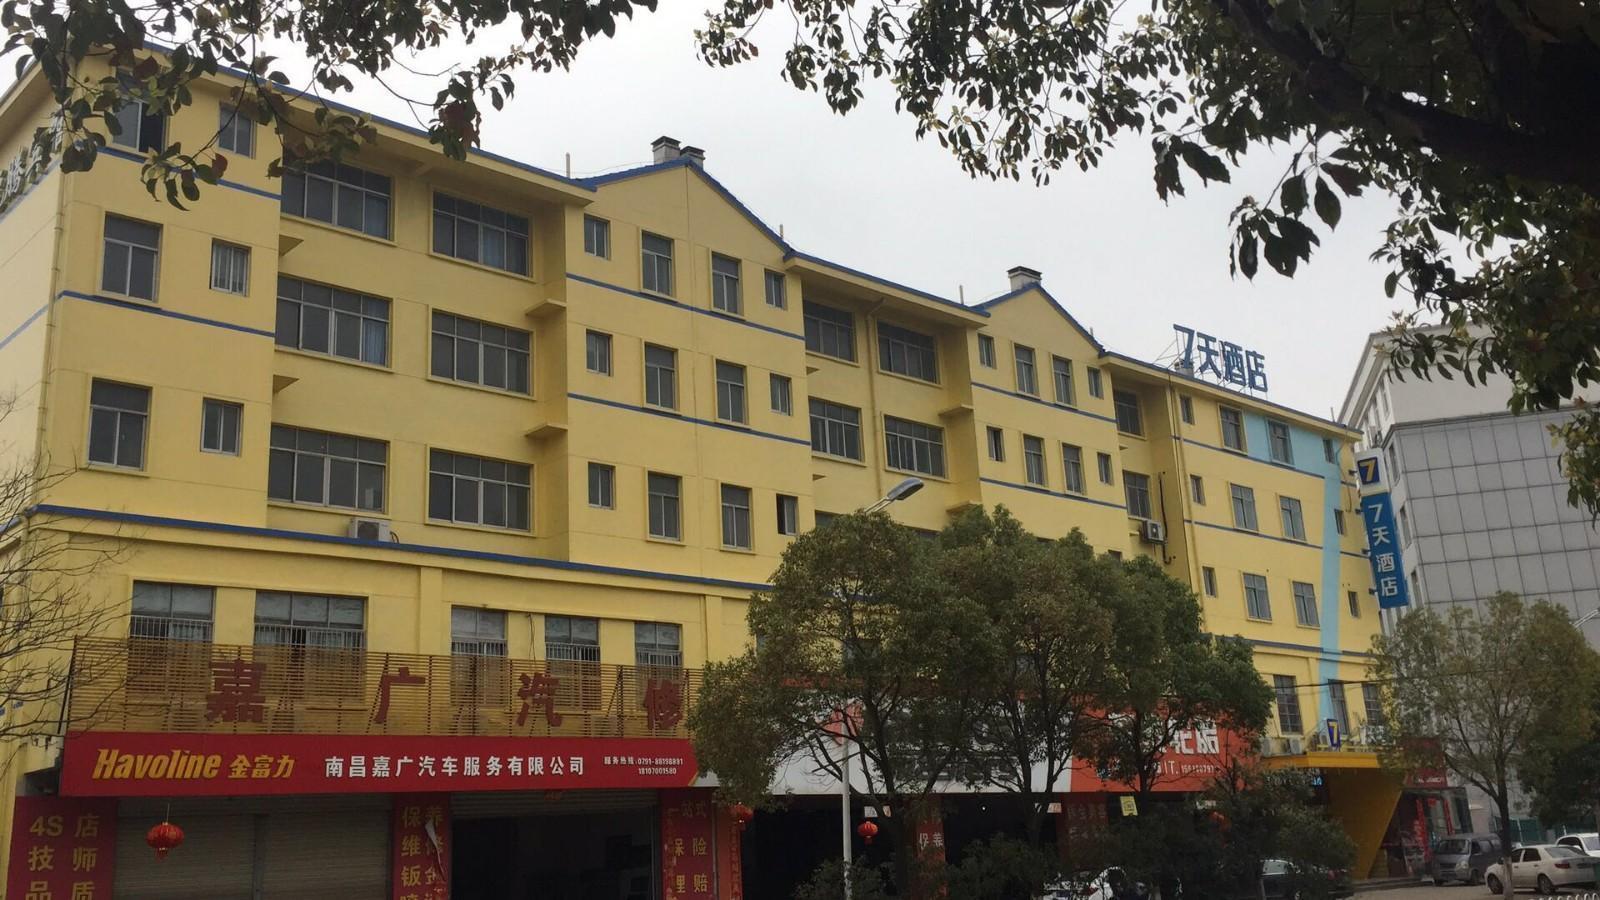 7 Days Inn�Nahchang Qingshanhu Avenue Minfeng Road